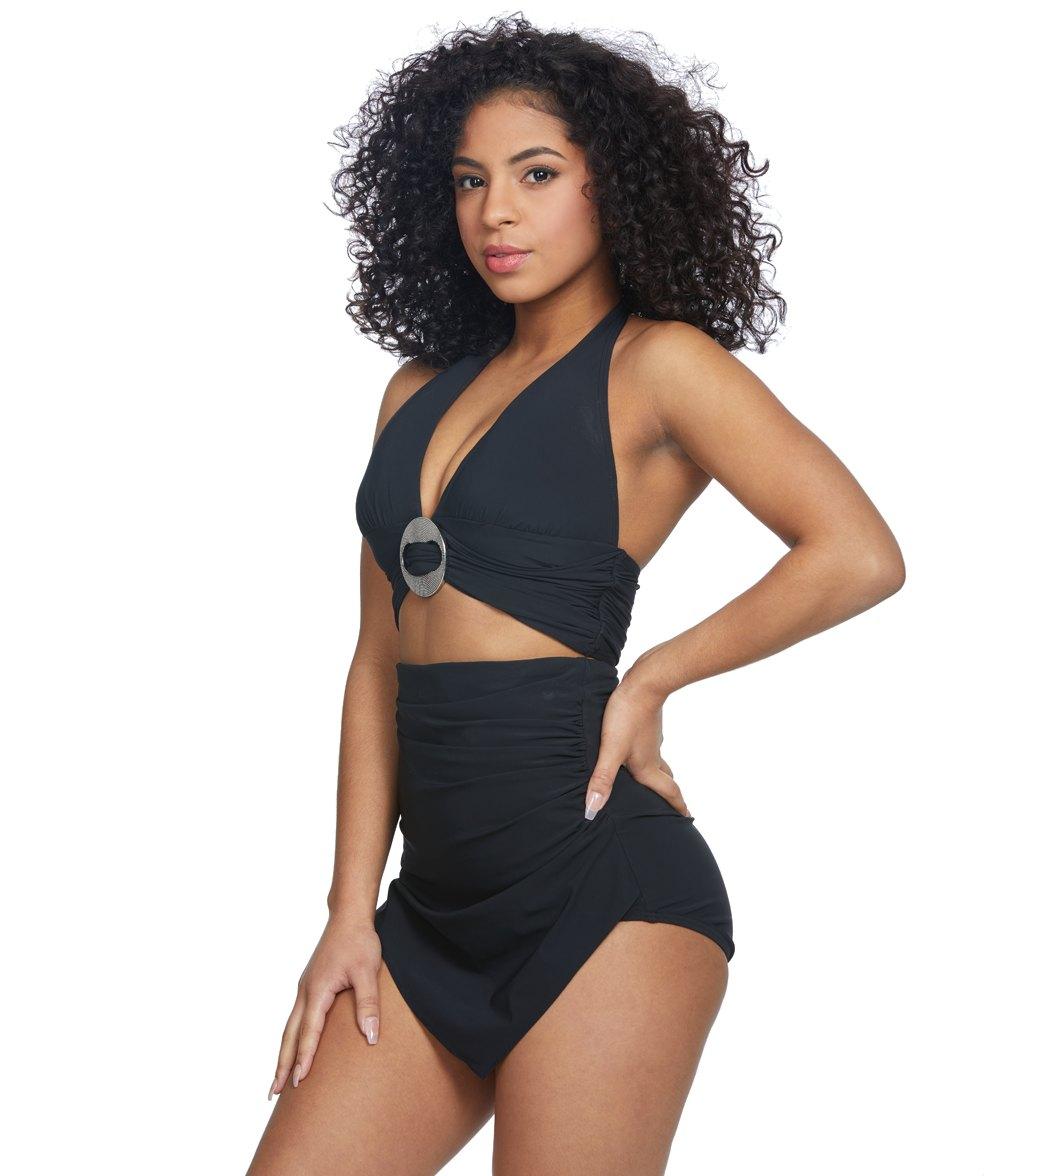 91b62ea7cf Coco Reef Contours Keepsake Brilliance Halter Bikini Top (C D Cup ...